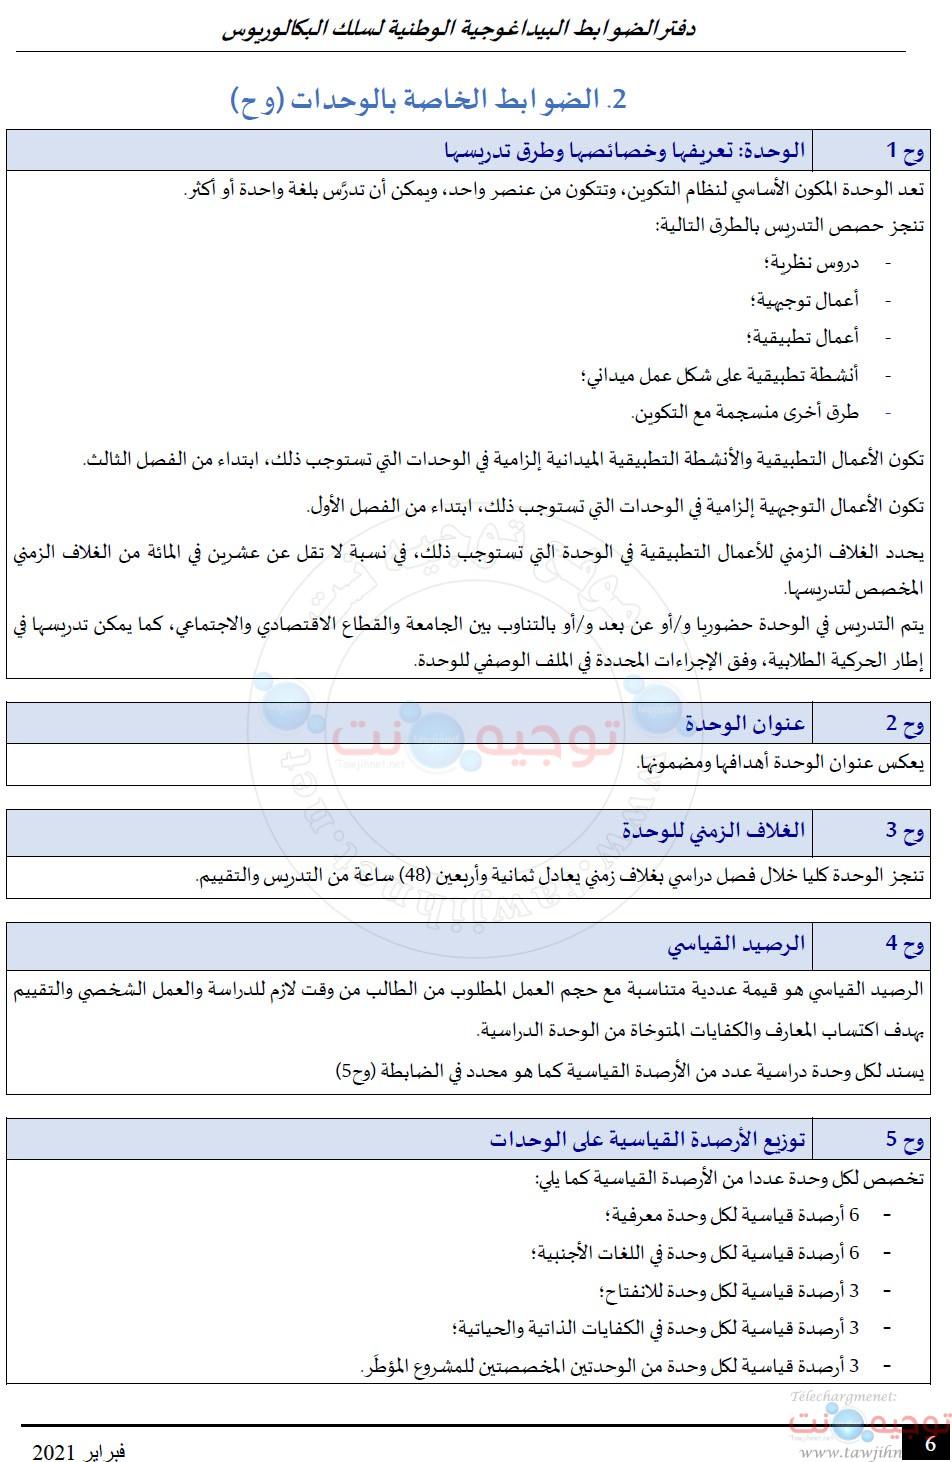 Bachelor-CNPN-normes-pedagoqiques-2021_Page_06.jpg